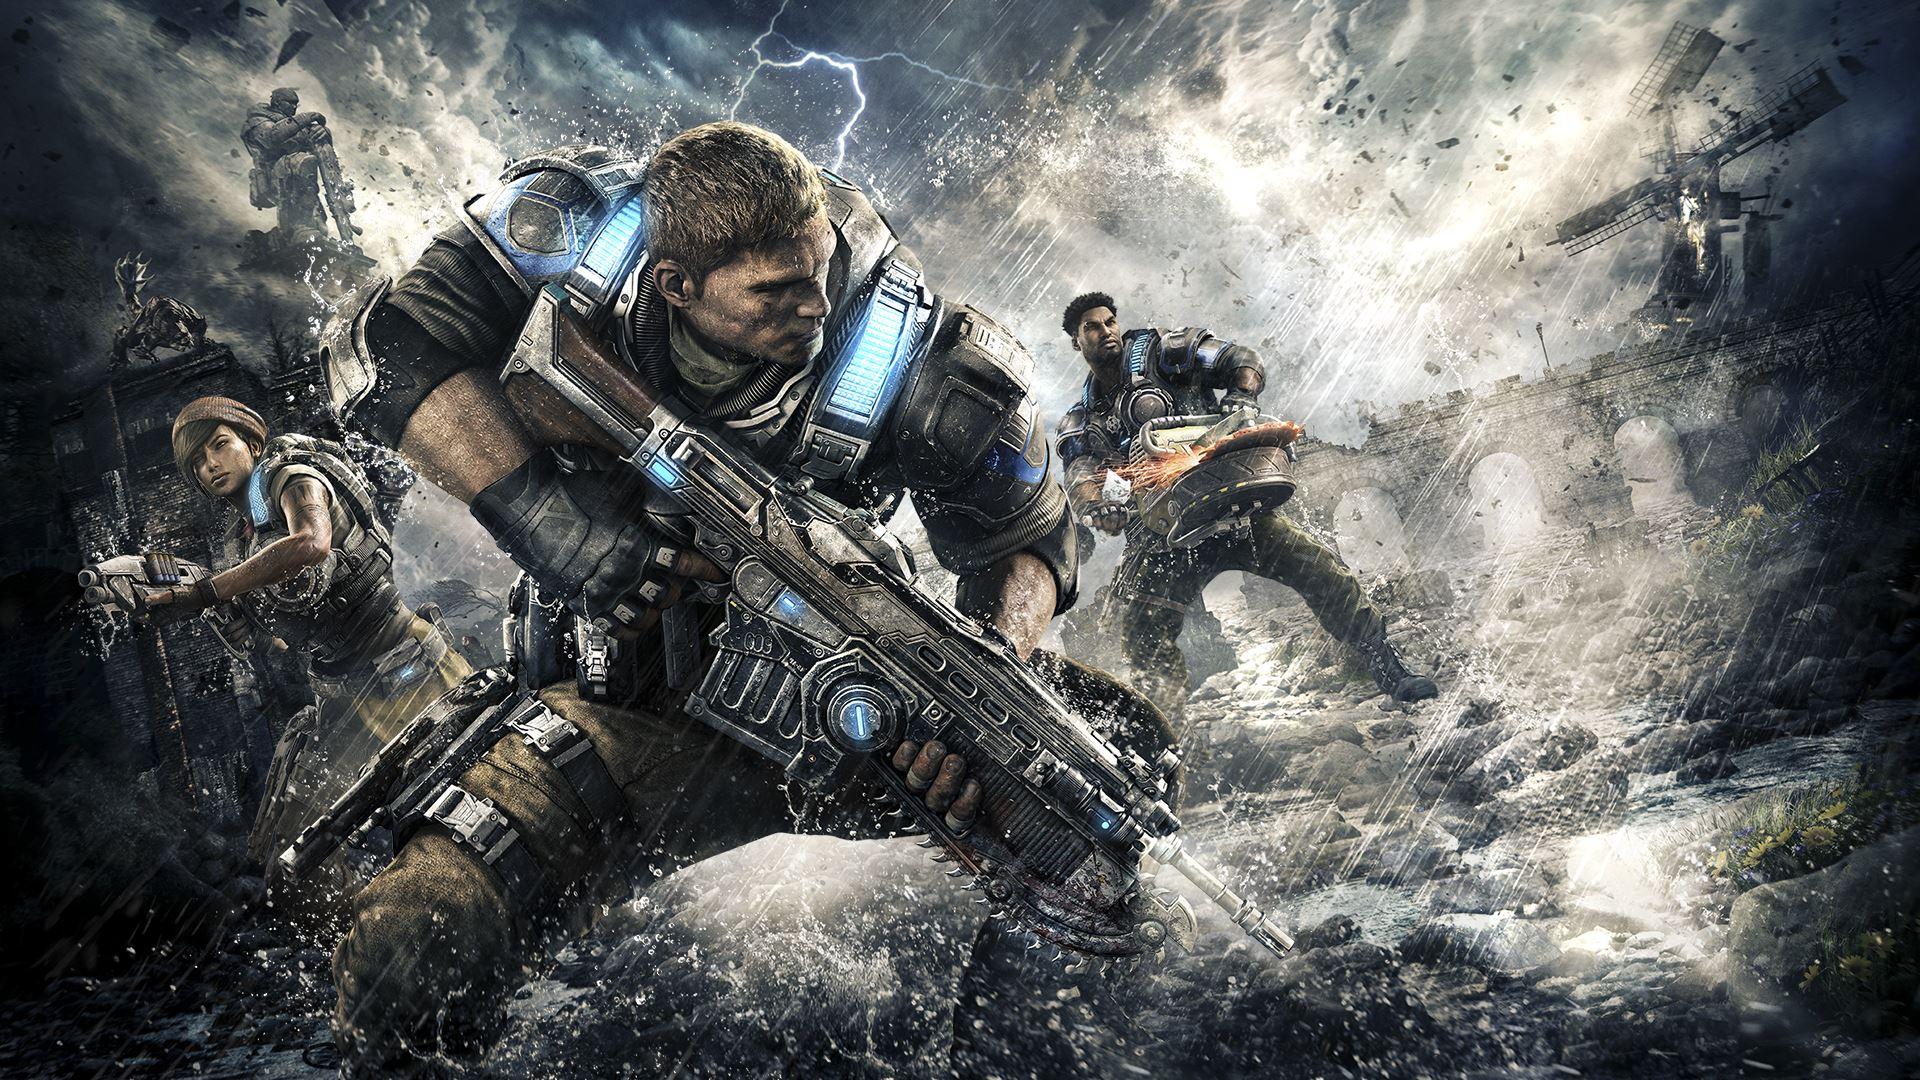 https://www.proibidoler.com/wp-content/uploads/2016/07/gears-of-war-4-apresentado-gameplay-de-campanha.jpg